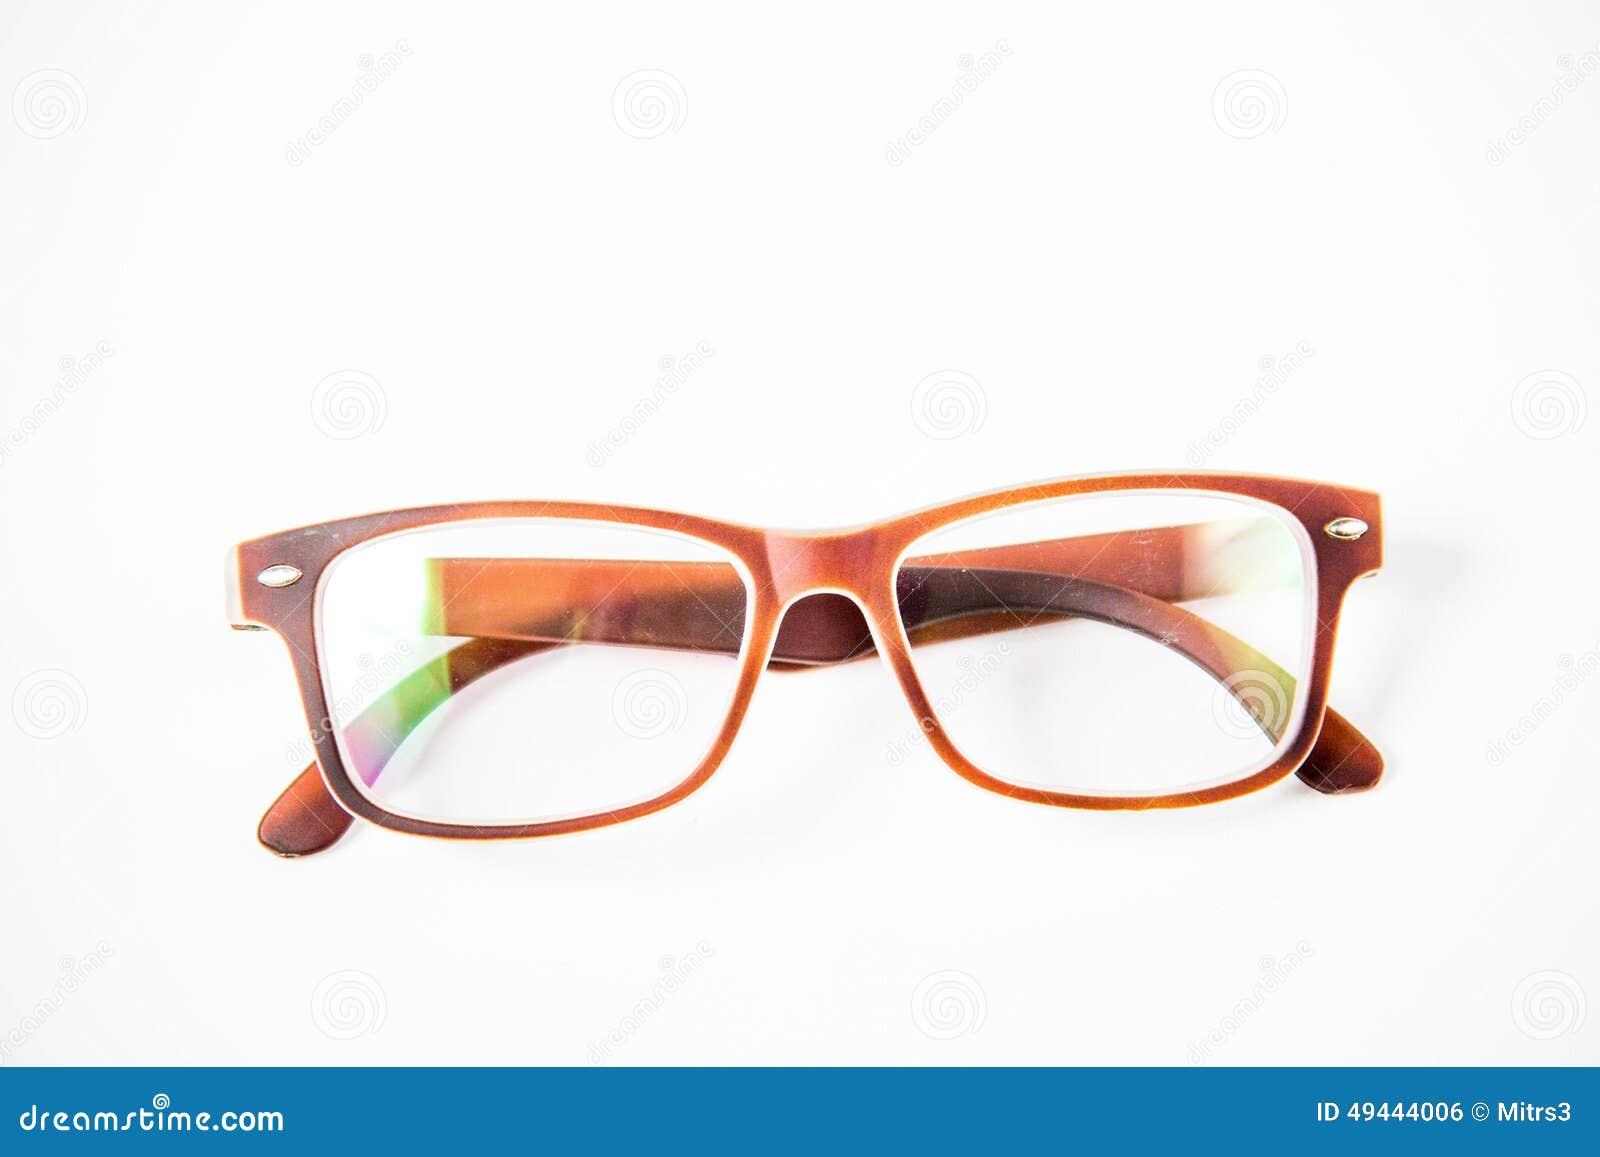 Eye glasses isolated